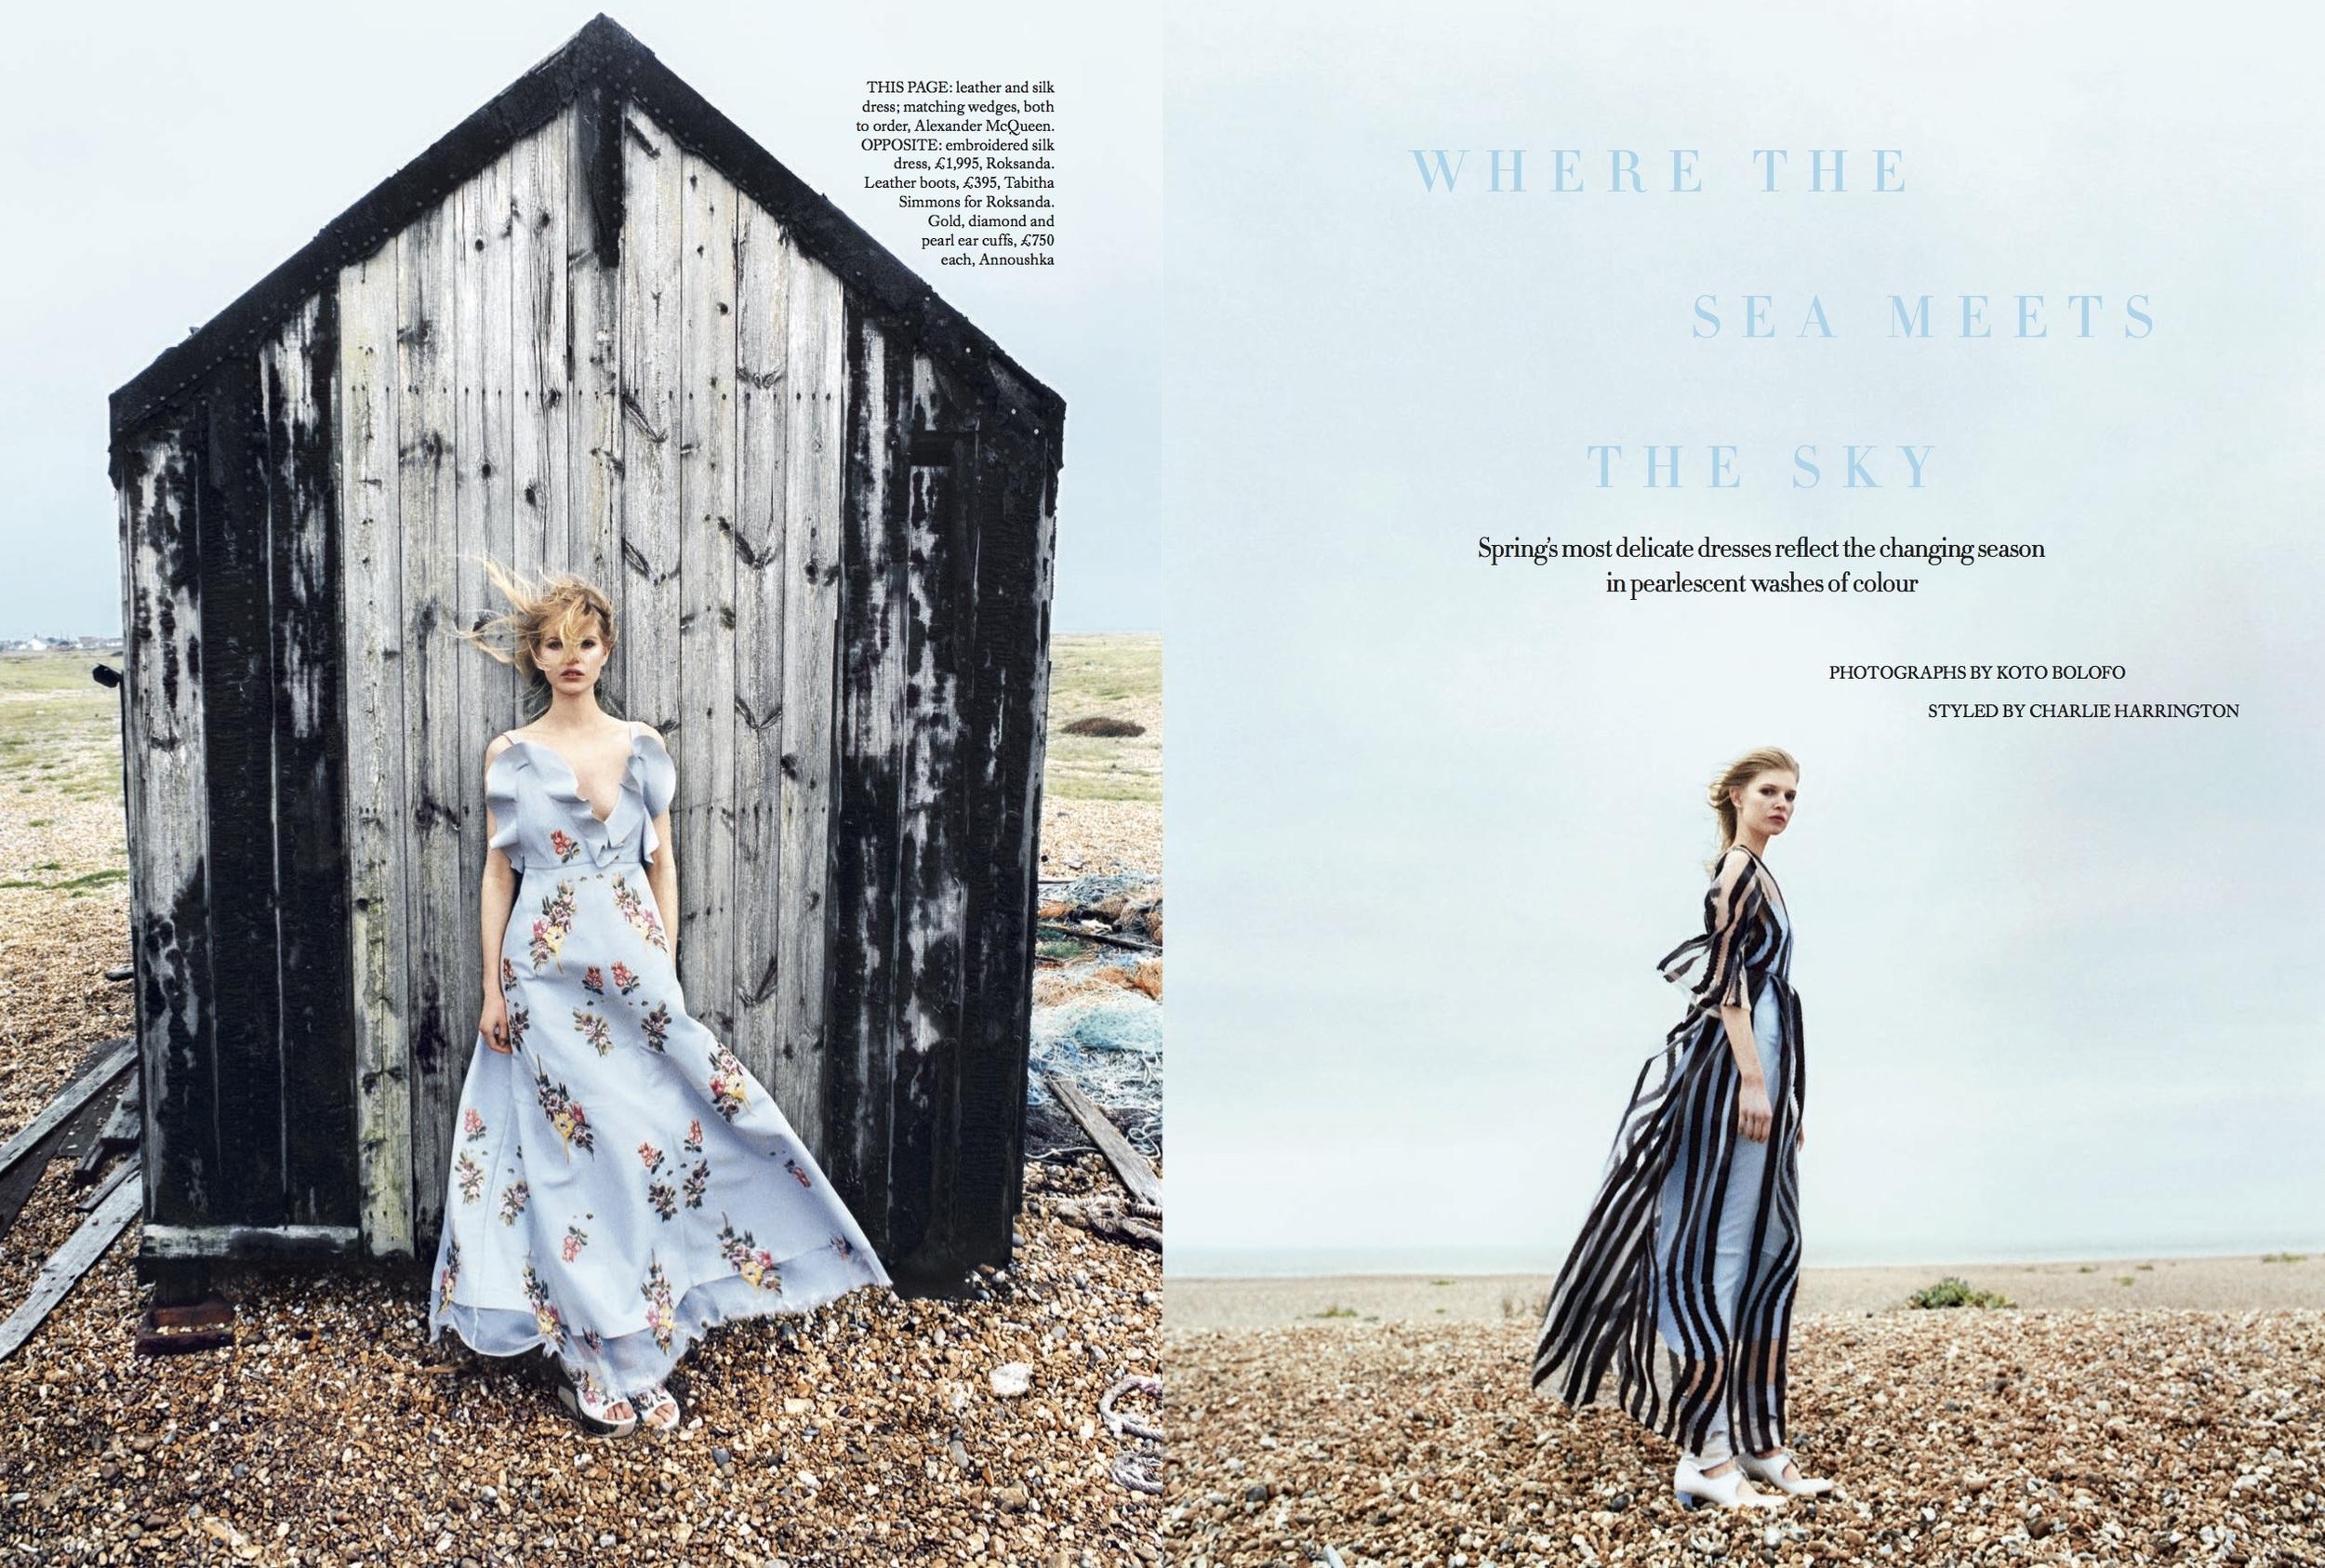 Ola Rudnicka Cover Story for Harper's Bazaar, styled by Charlie Harrington. Spread 1.